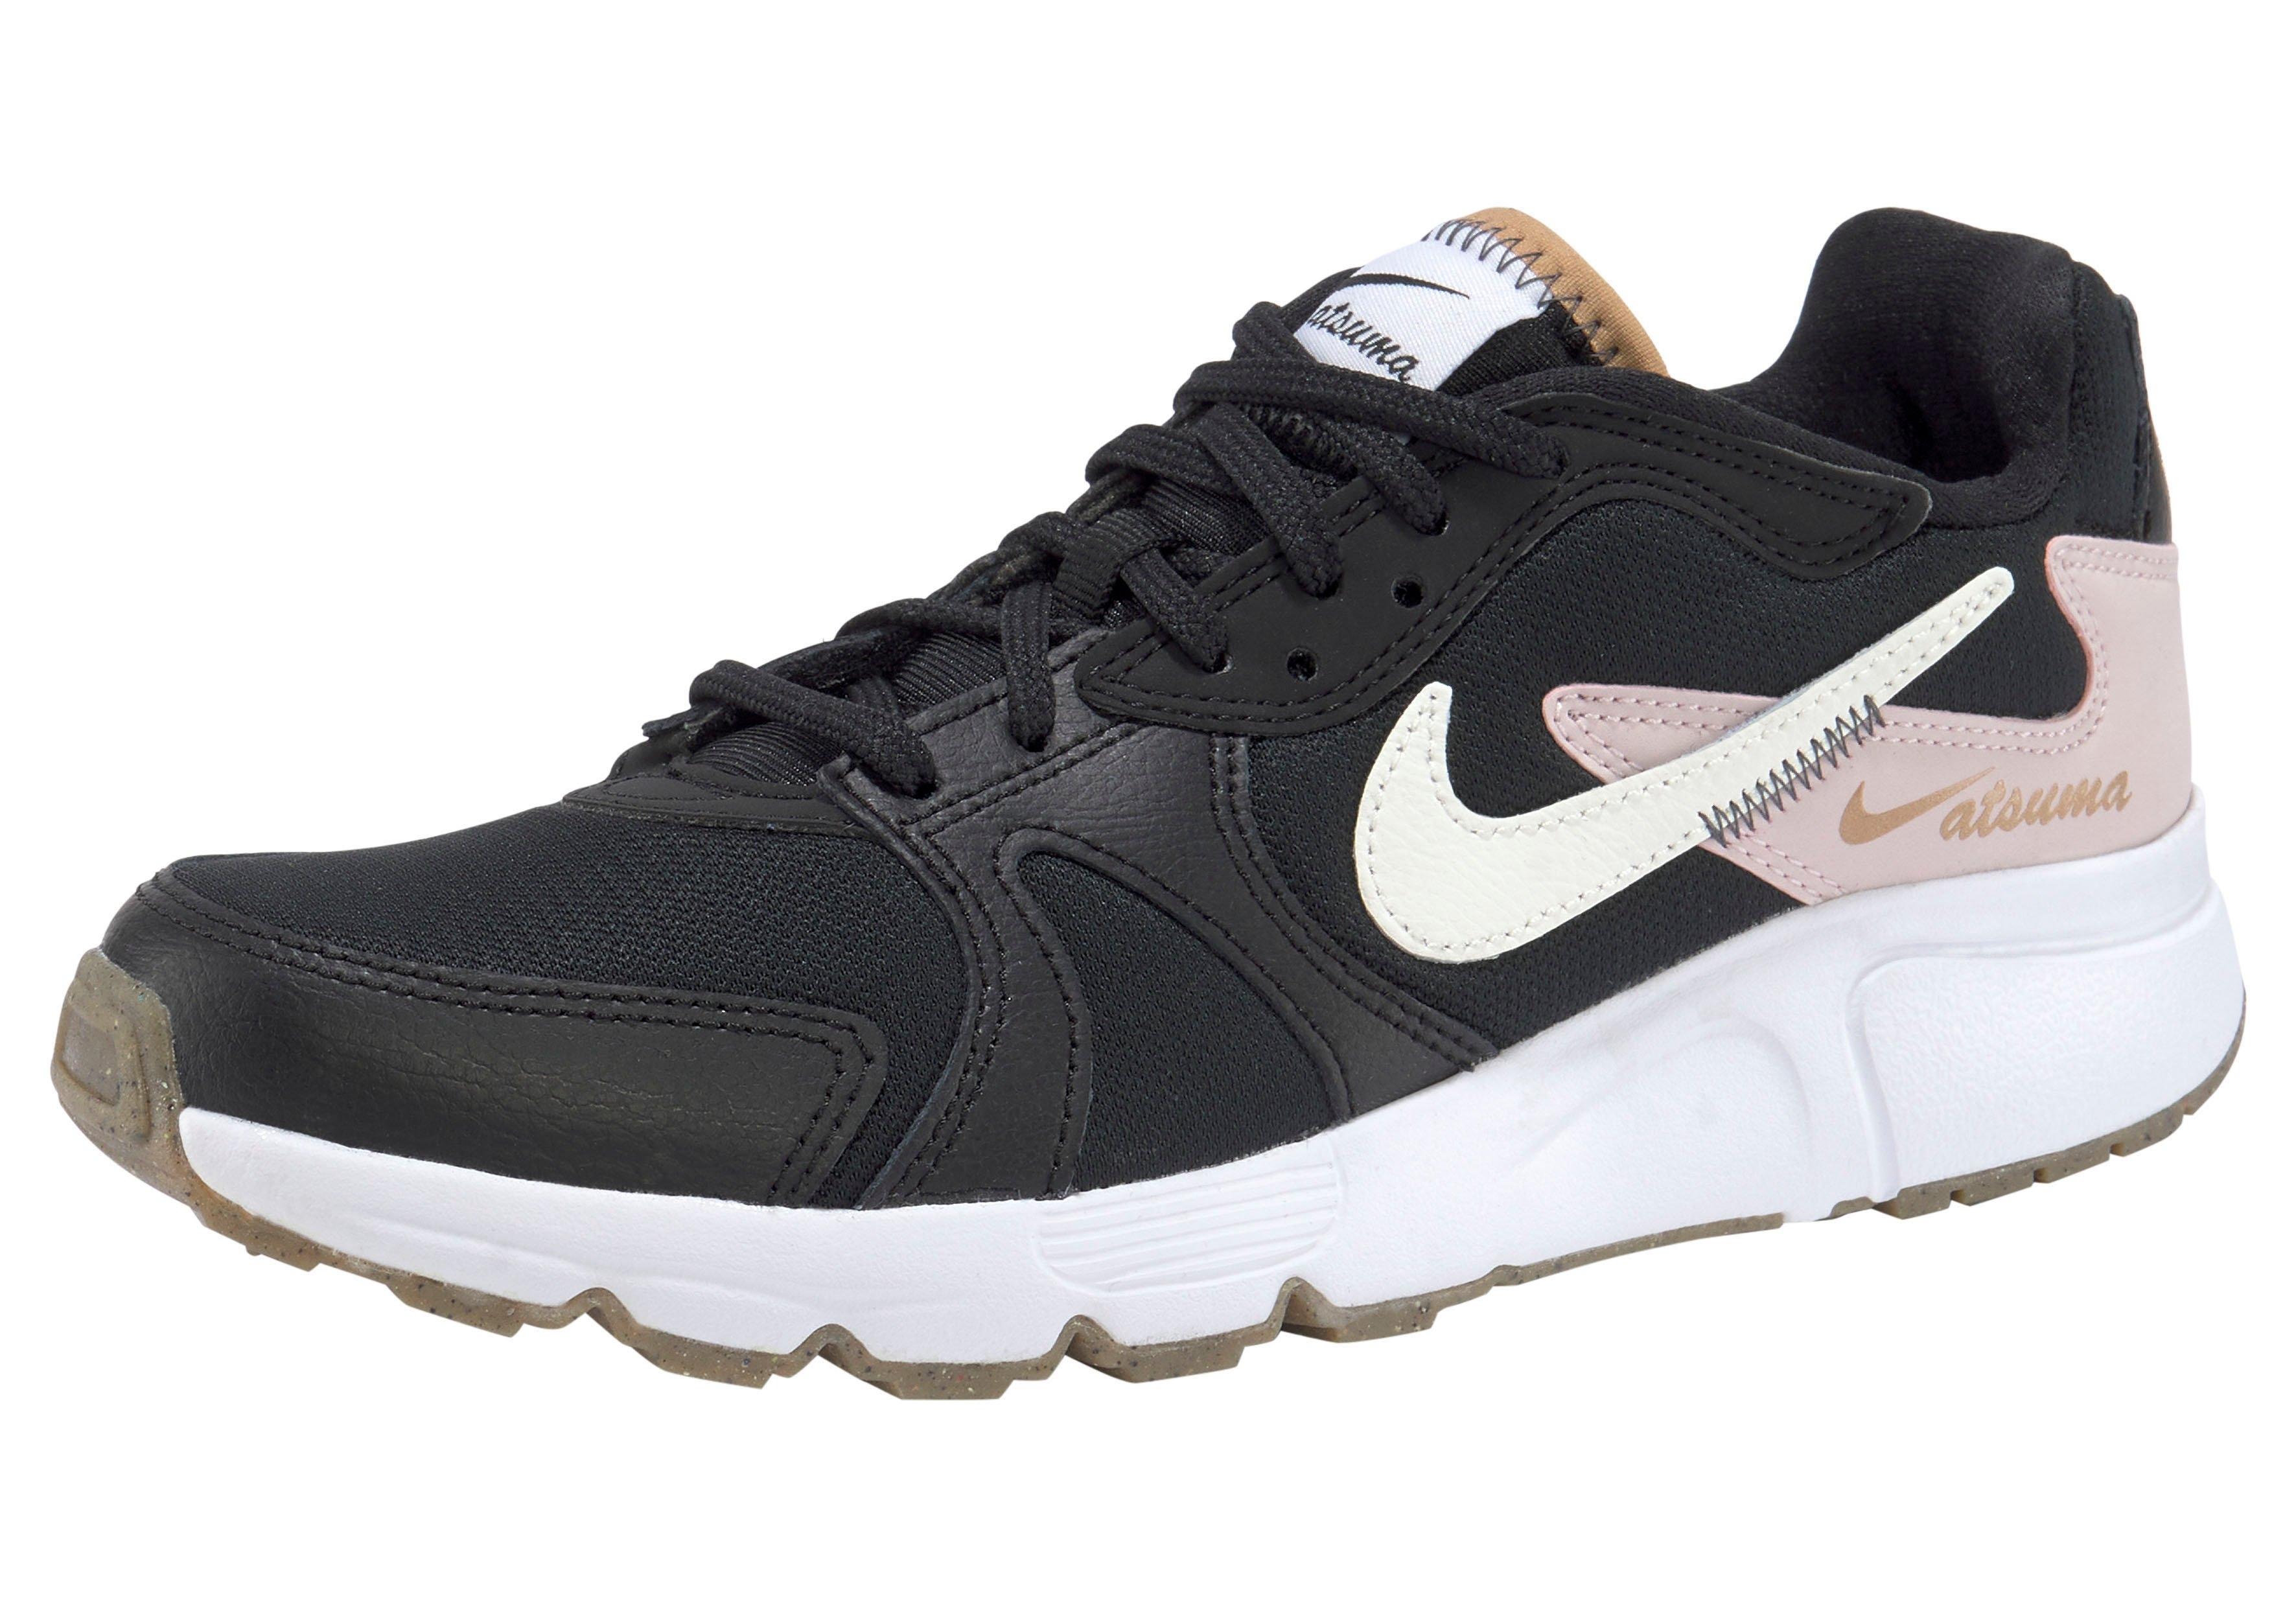 Nike Sportswear Nike sneakers »Wmns Atsuma« - gratis ruilen op otto.nl